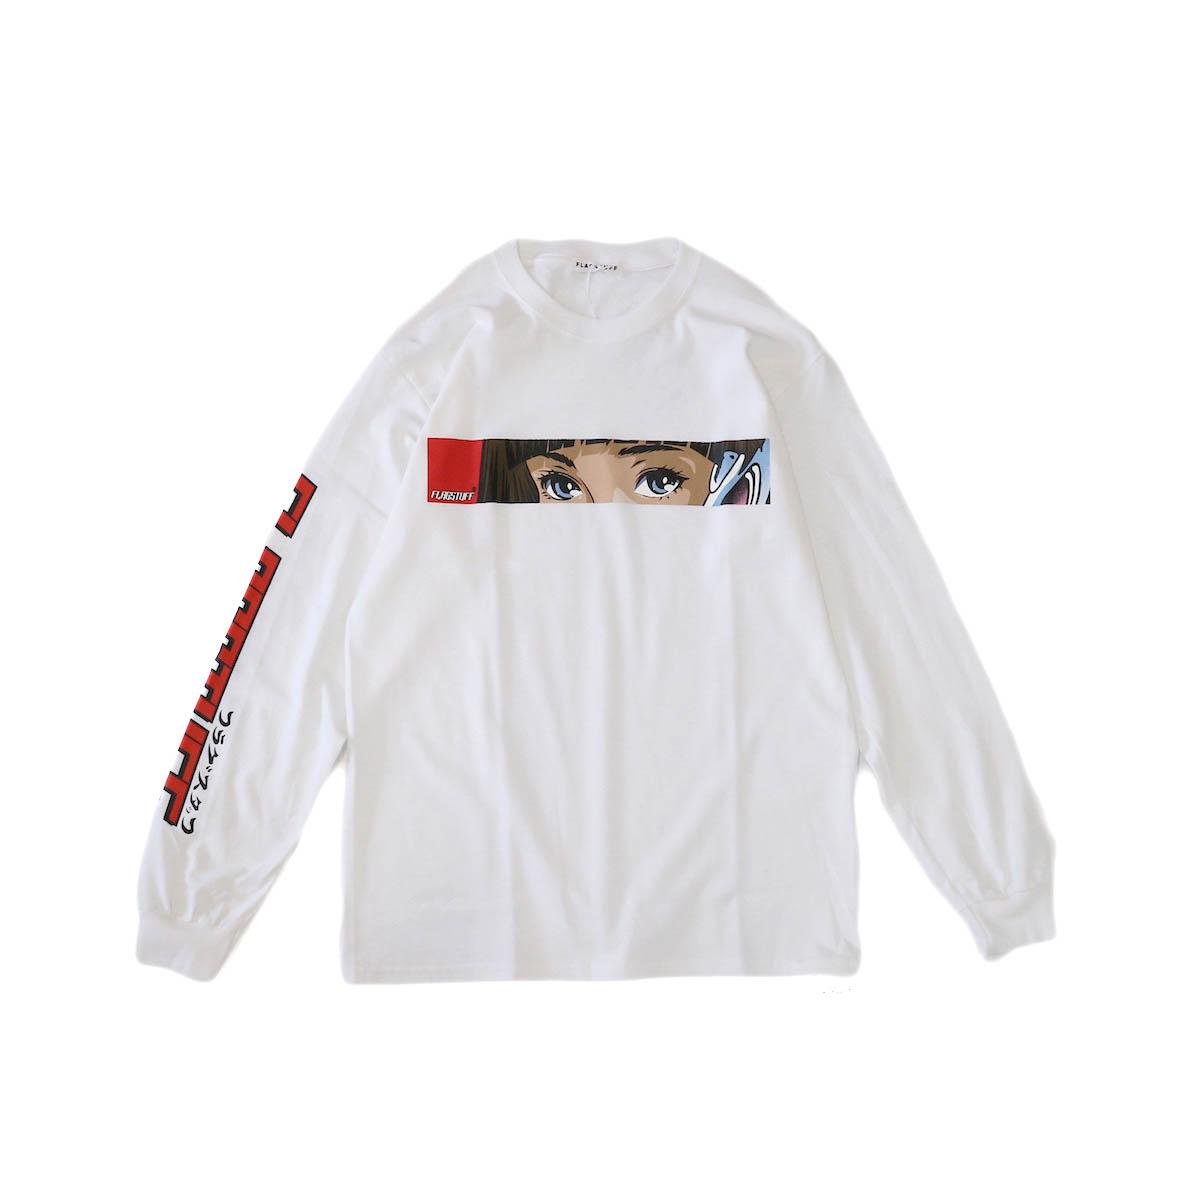 F-LAGSTUF-F / Dream Long Sleeve Tee -White